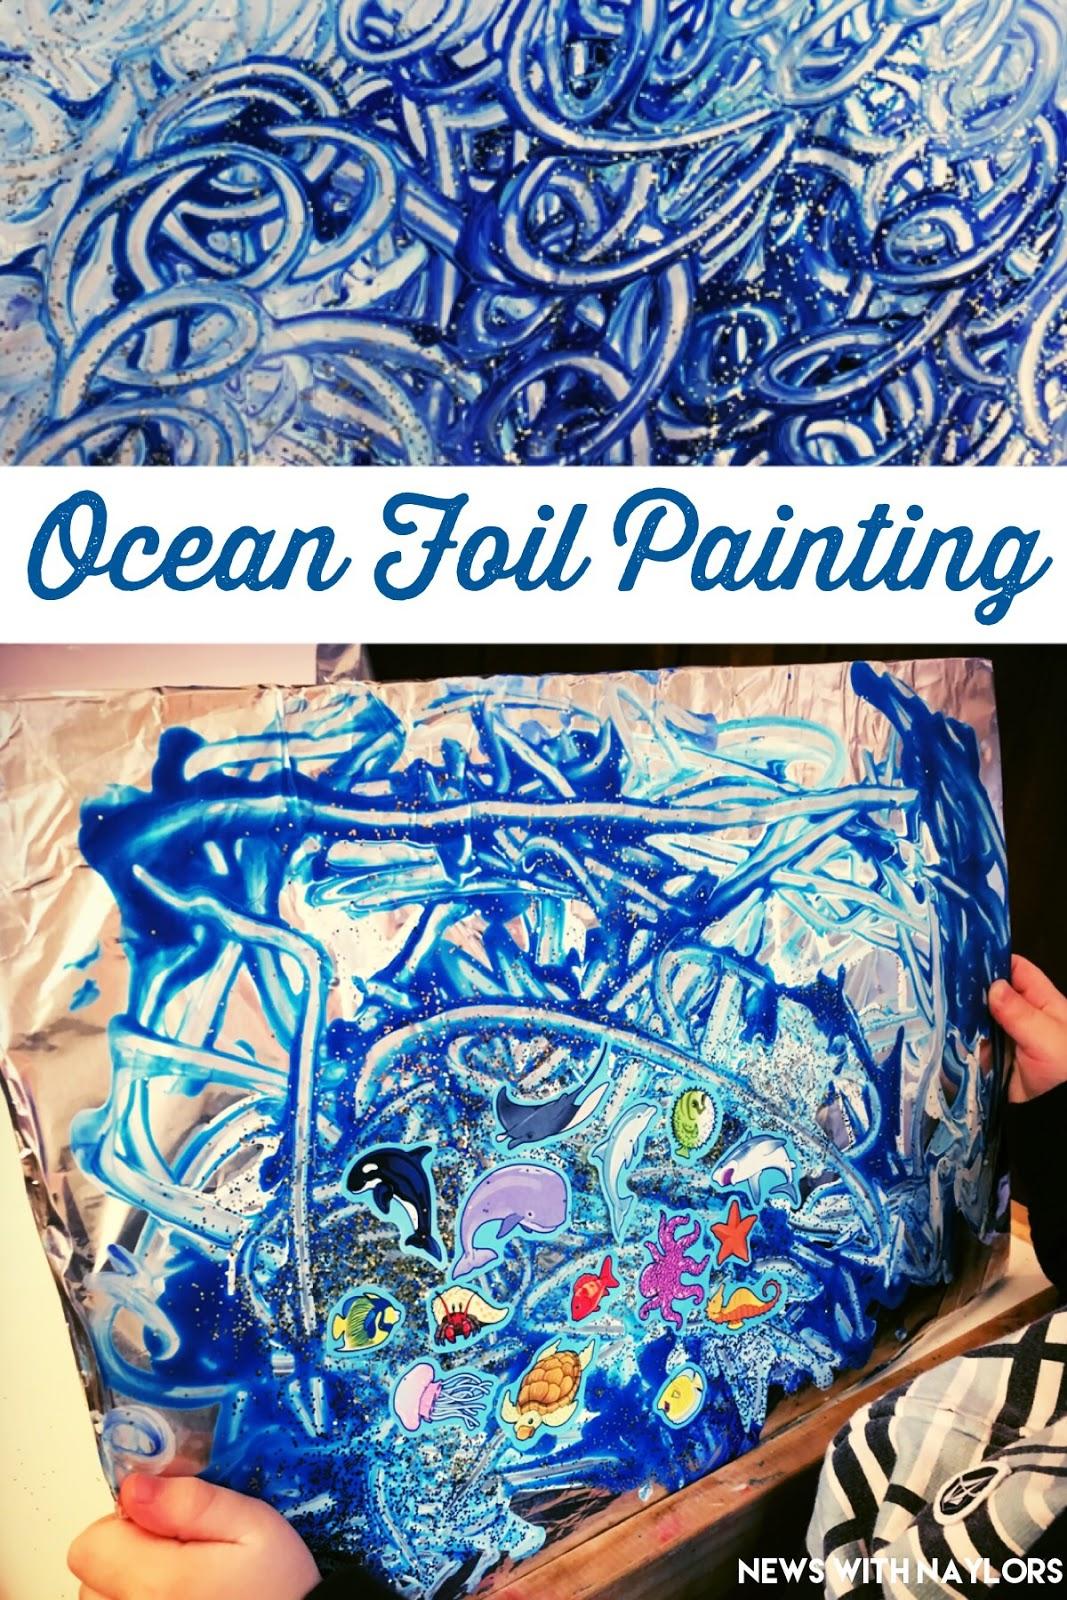 Ocean Foil Painting